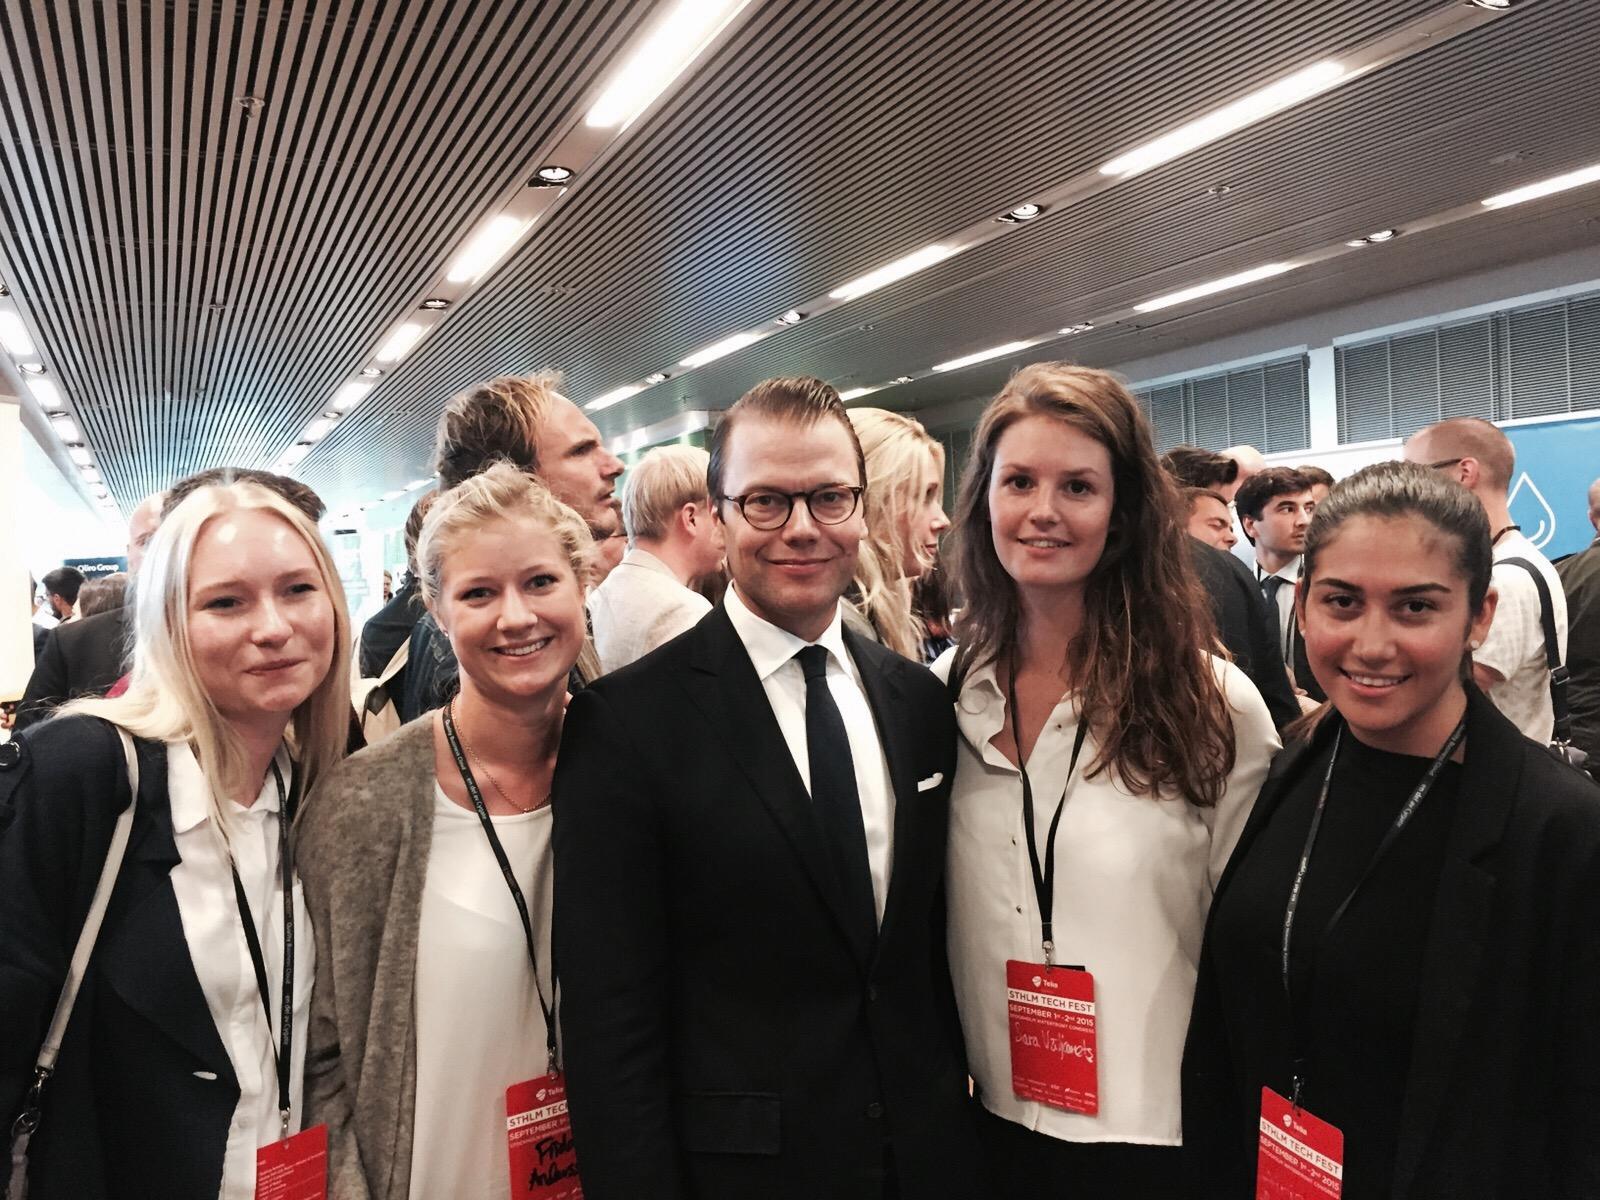 Me, Frida, Sara and Ajje from Pepp Sthlm talking to Prince Daniel!